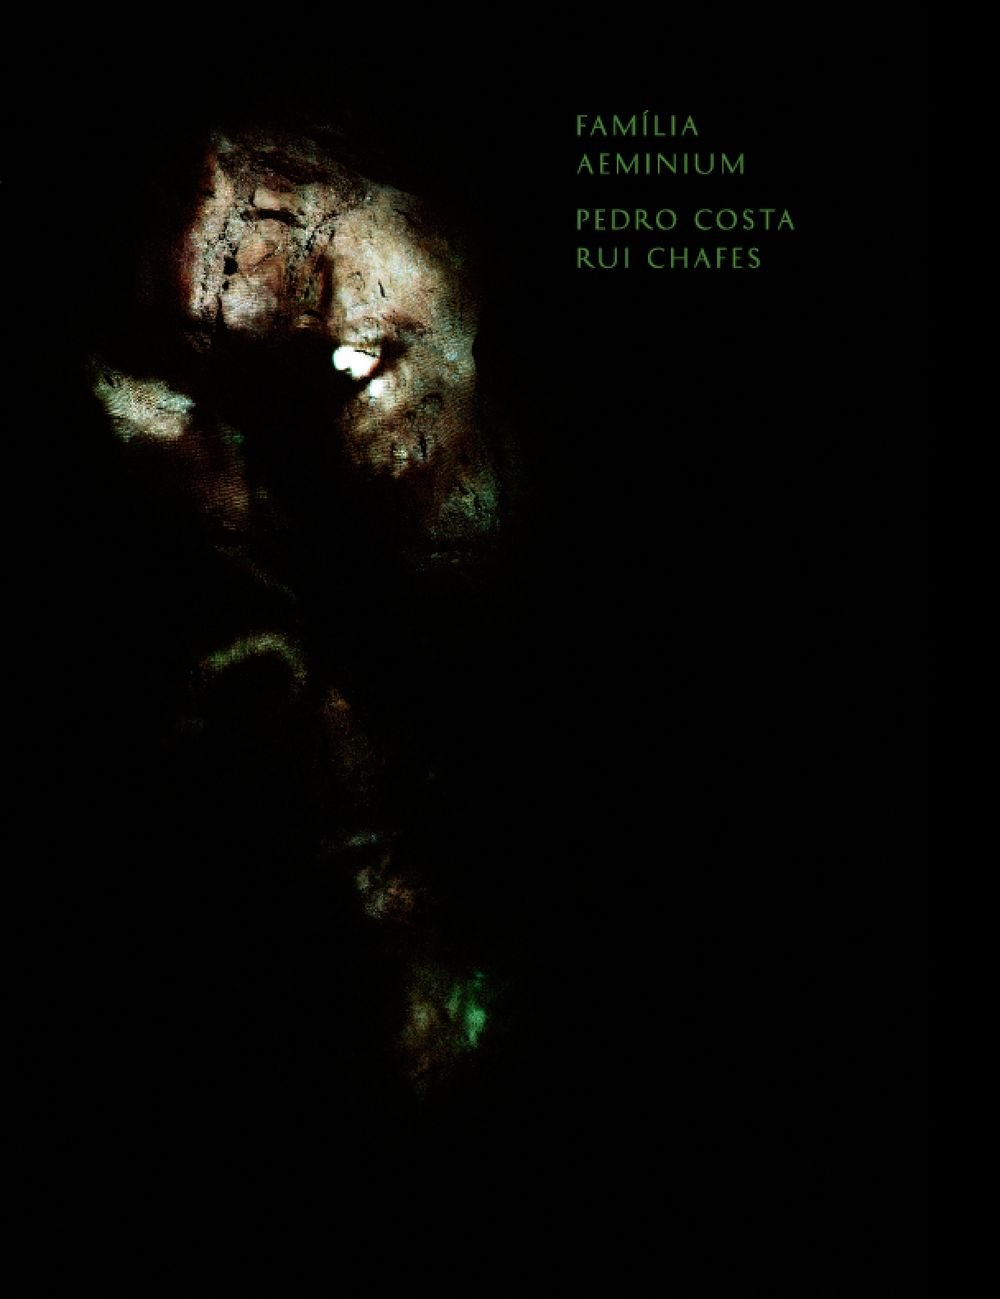 Família Aeminium' de Pedro Costa, Rui Chafes e poema de João Miguel Fernandes Jorge, pela chancela Pierre Von Kleist Editions